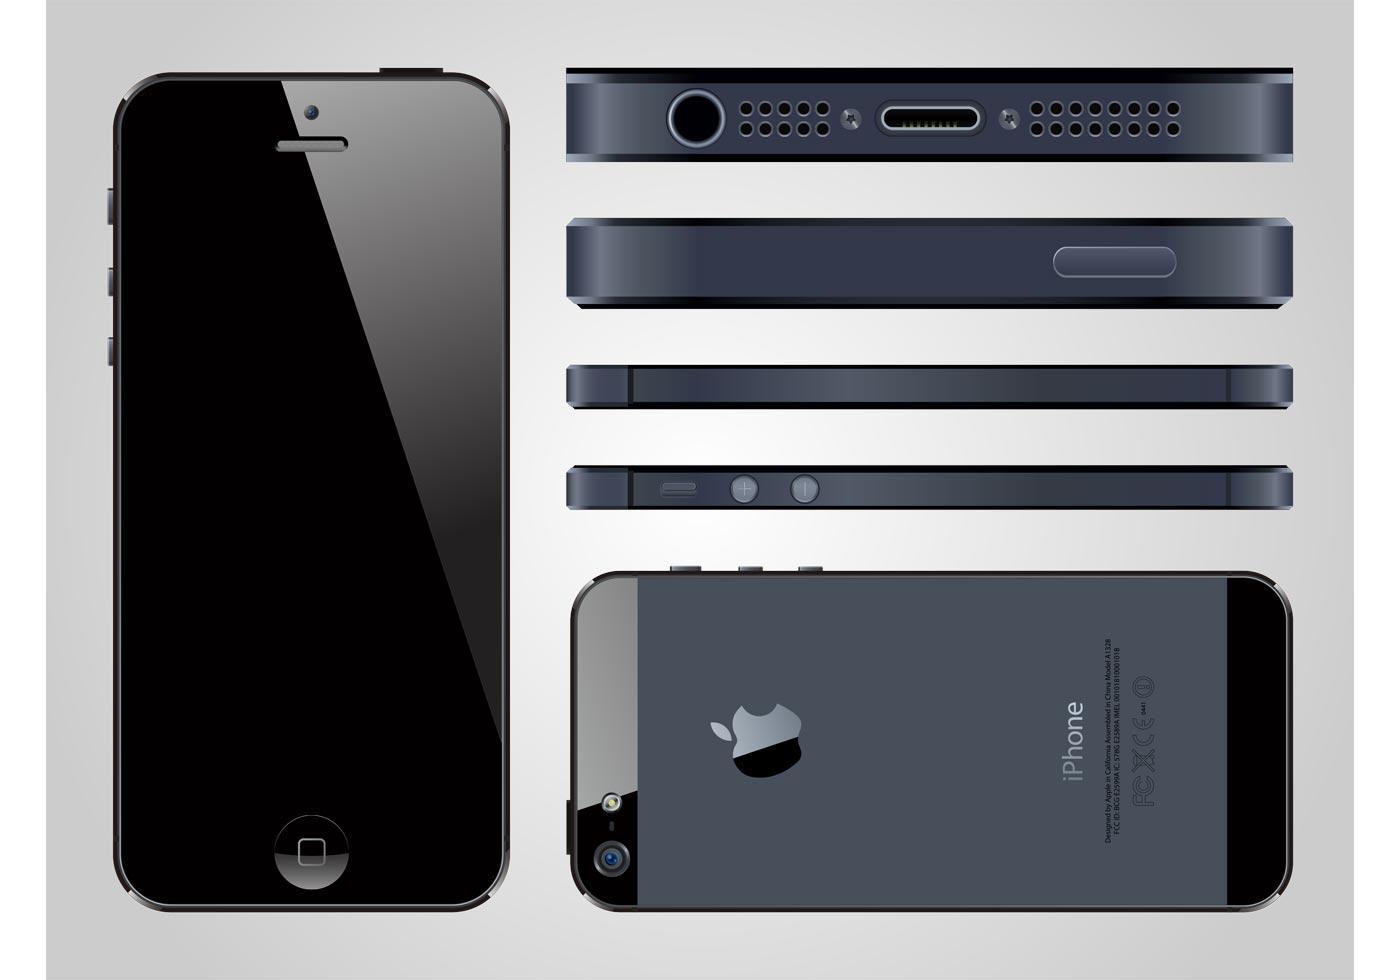 iPhone 5 Vector - Download Free Vectors, Clipart Graphics ...